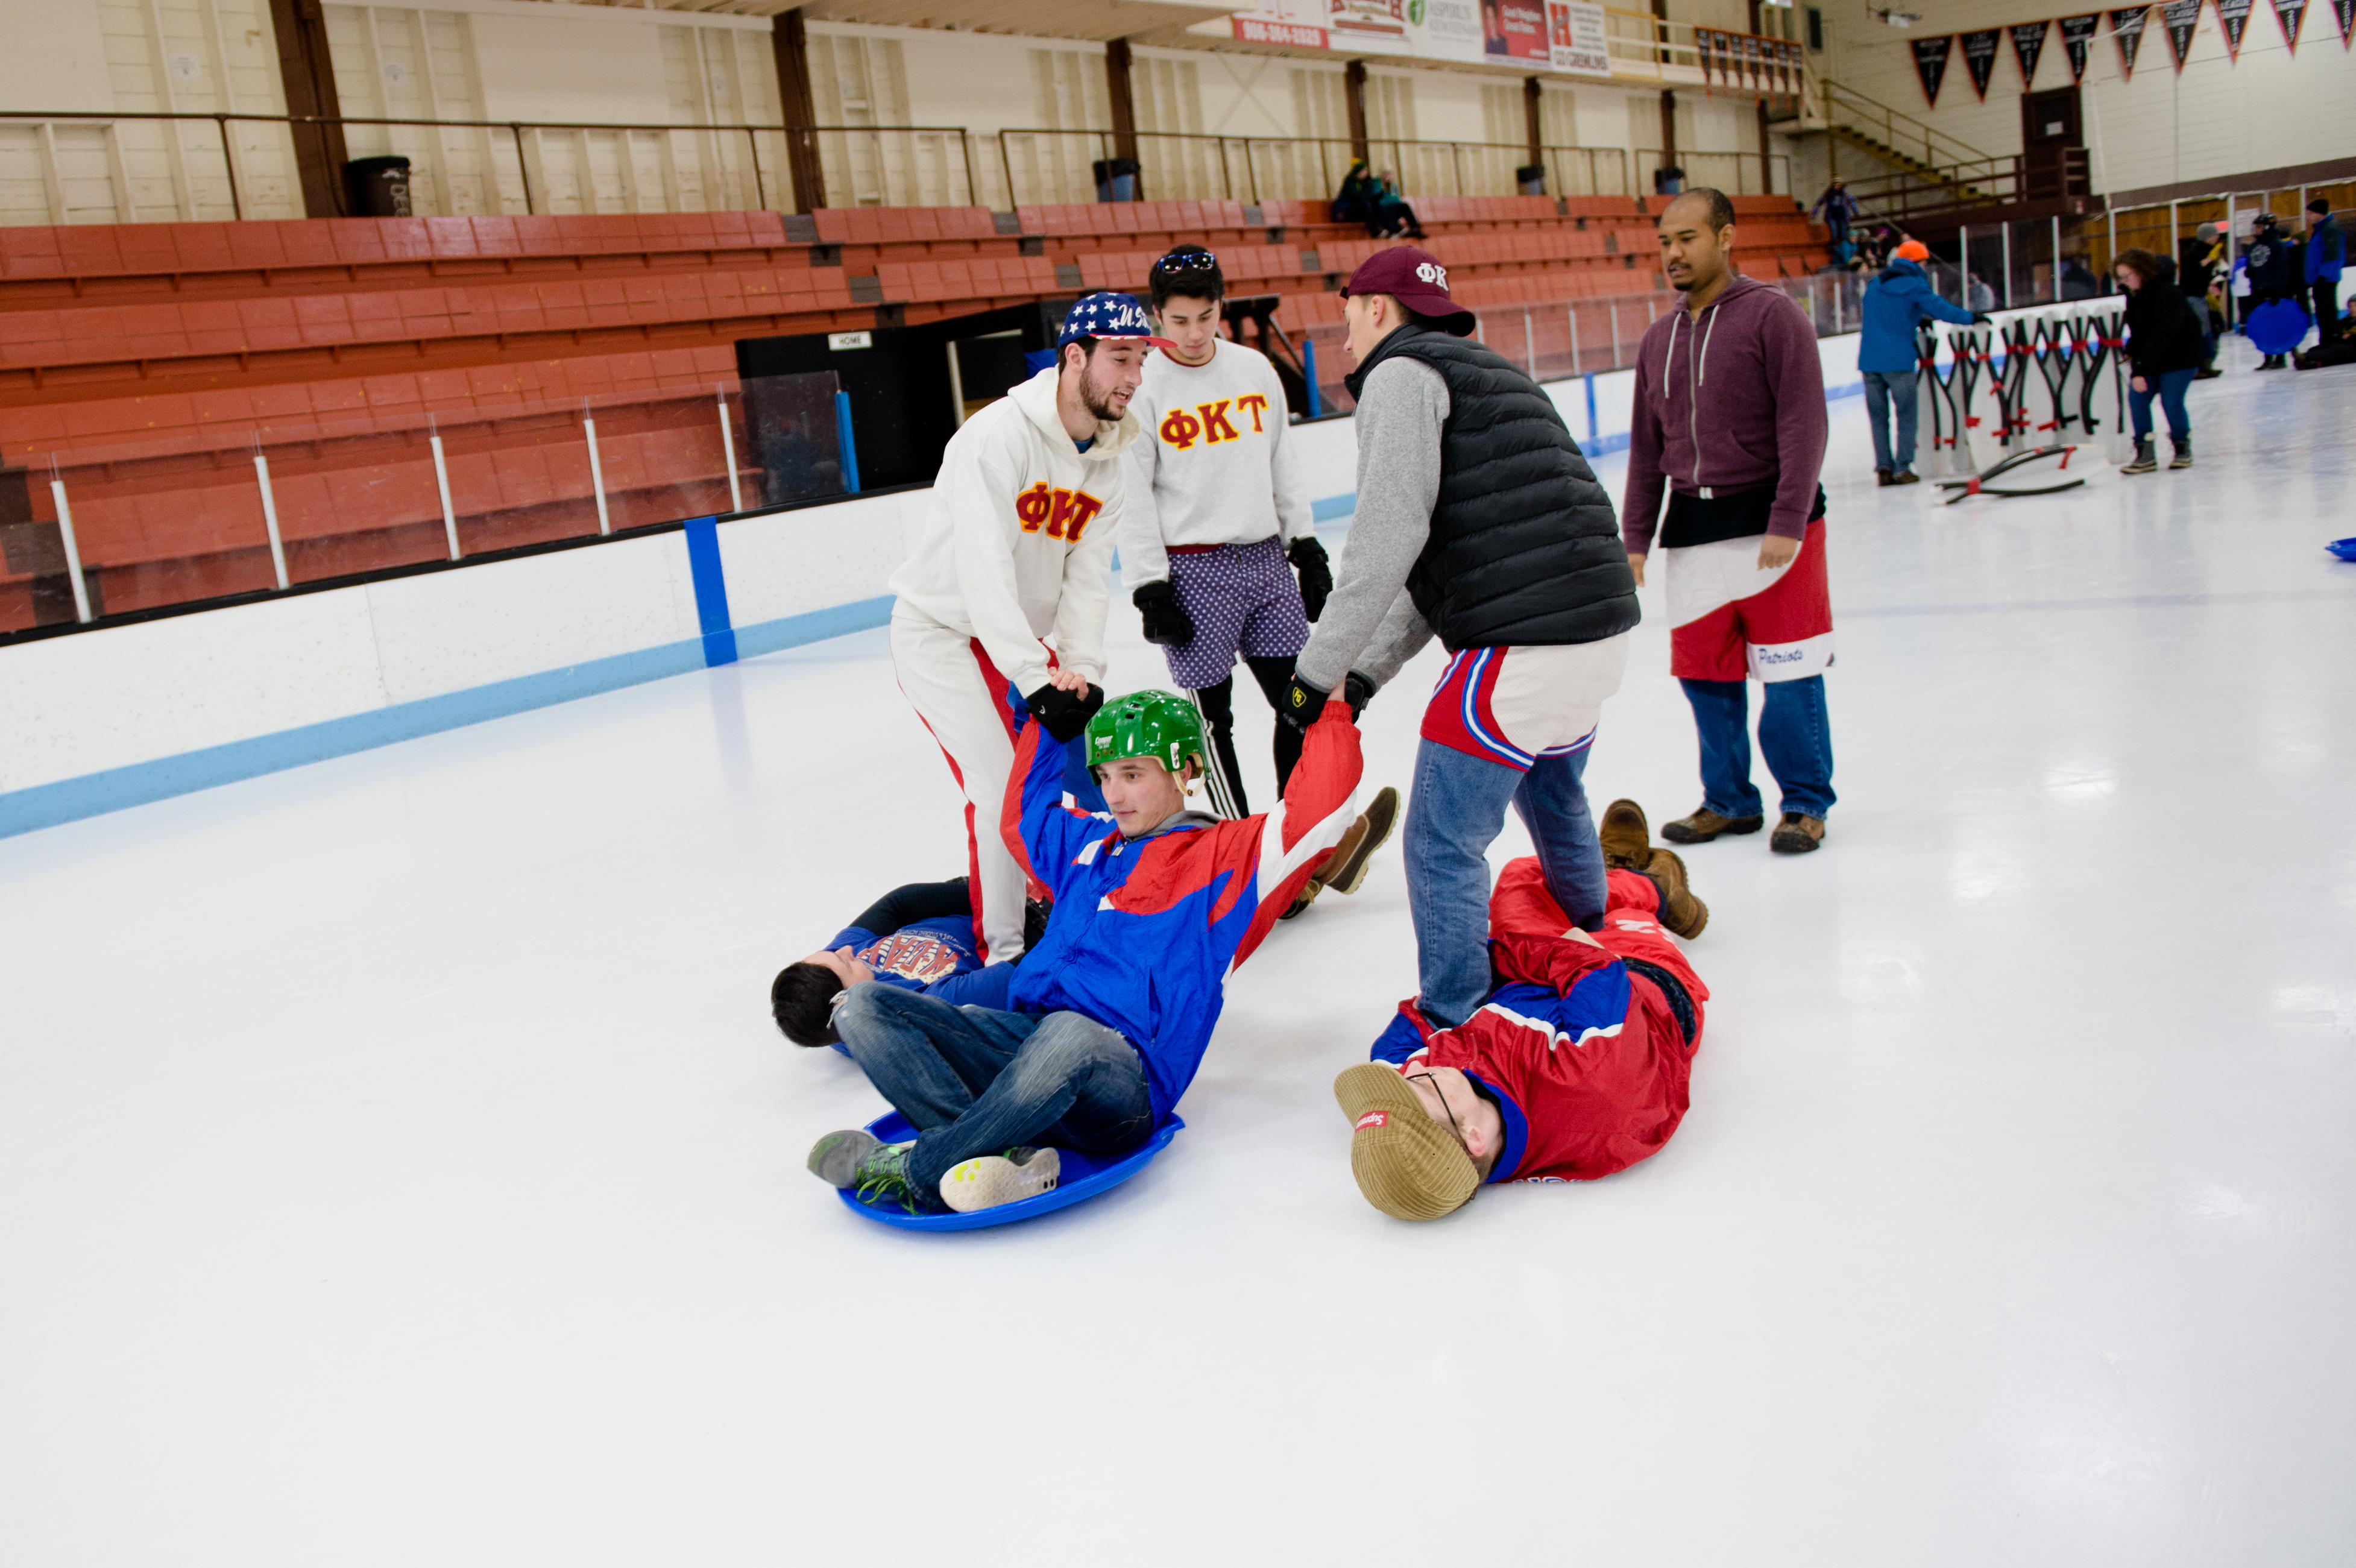 Ice Bowling 201601260093 copy